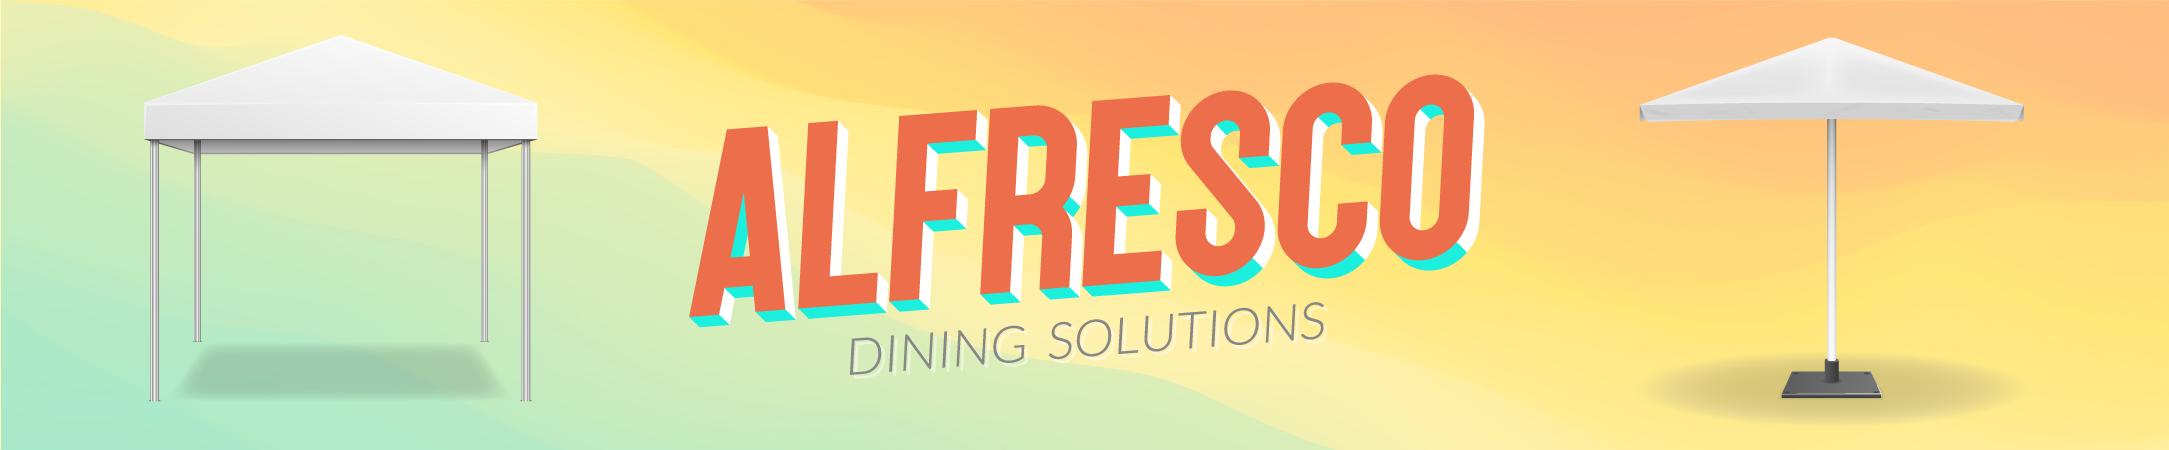 Alfresco-Banner